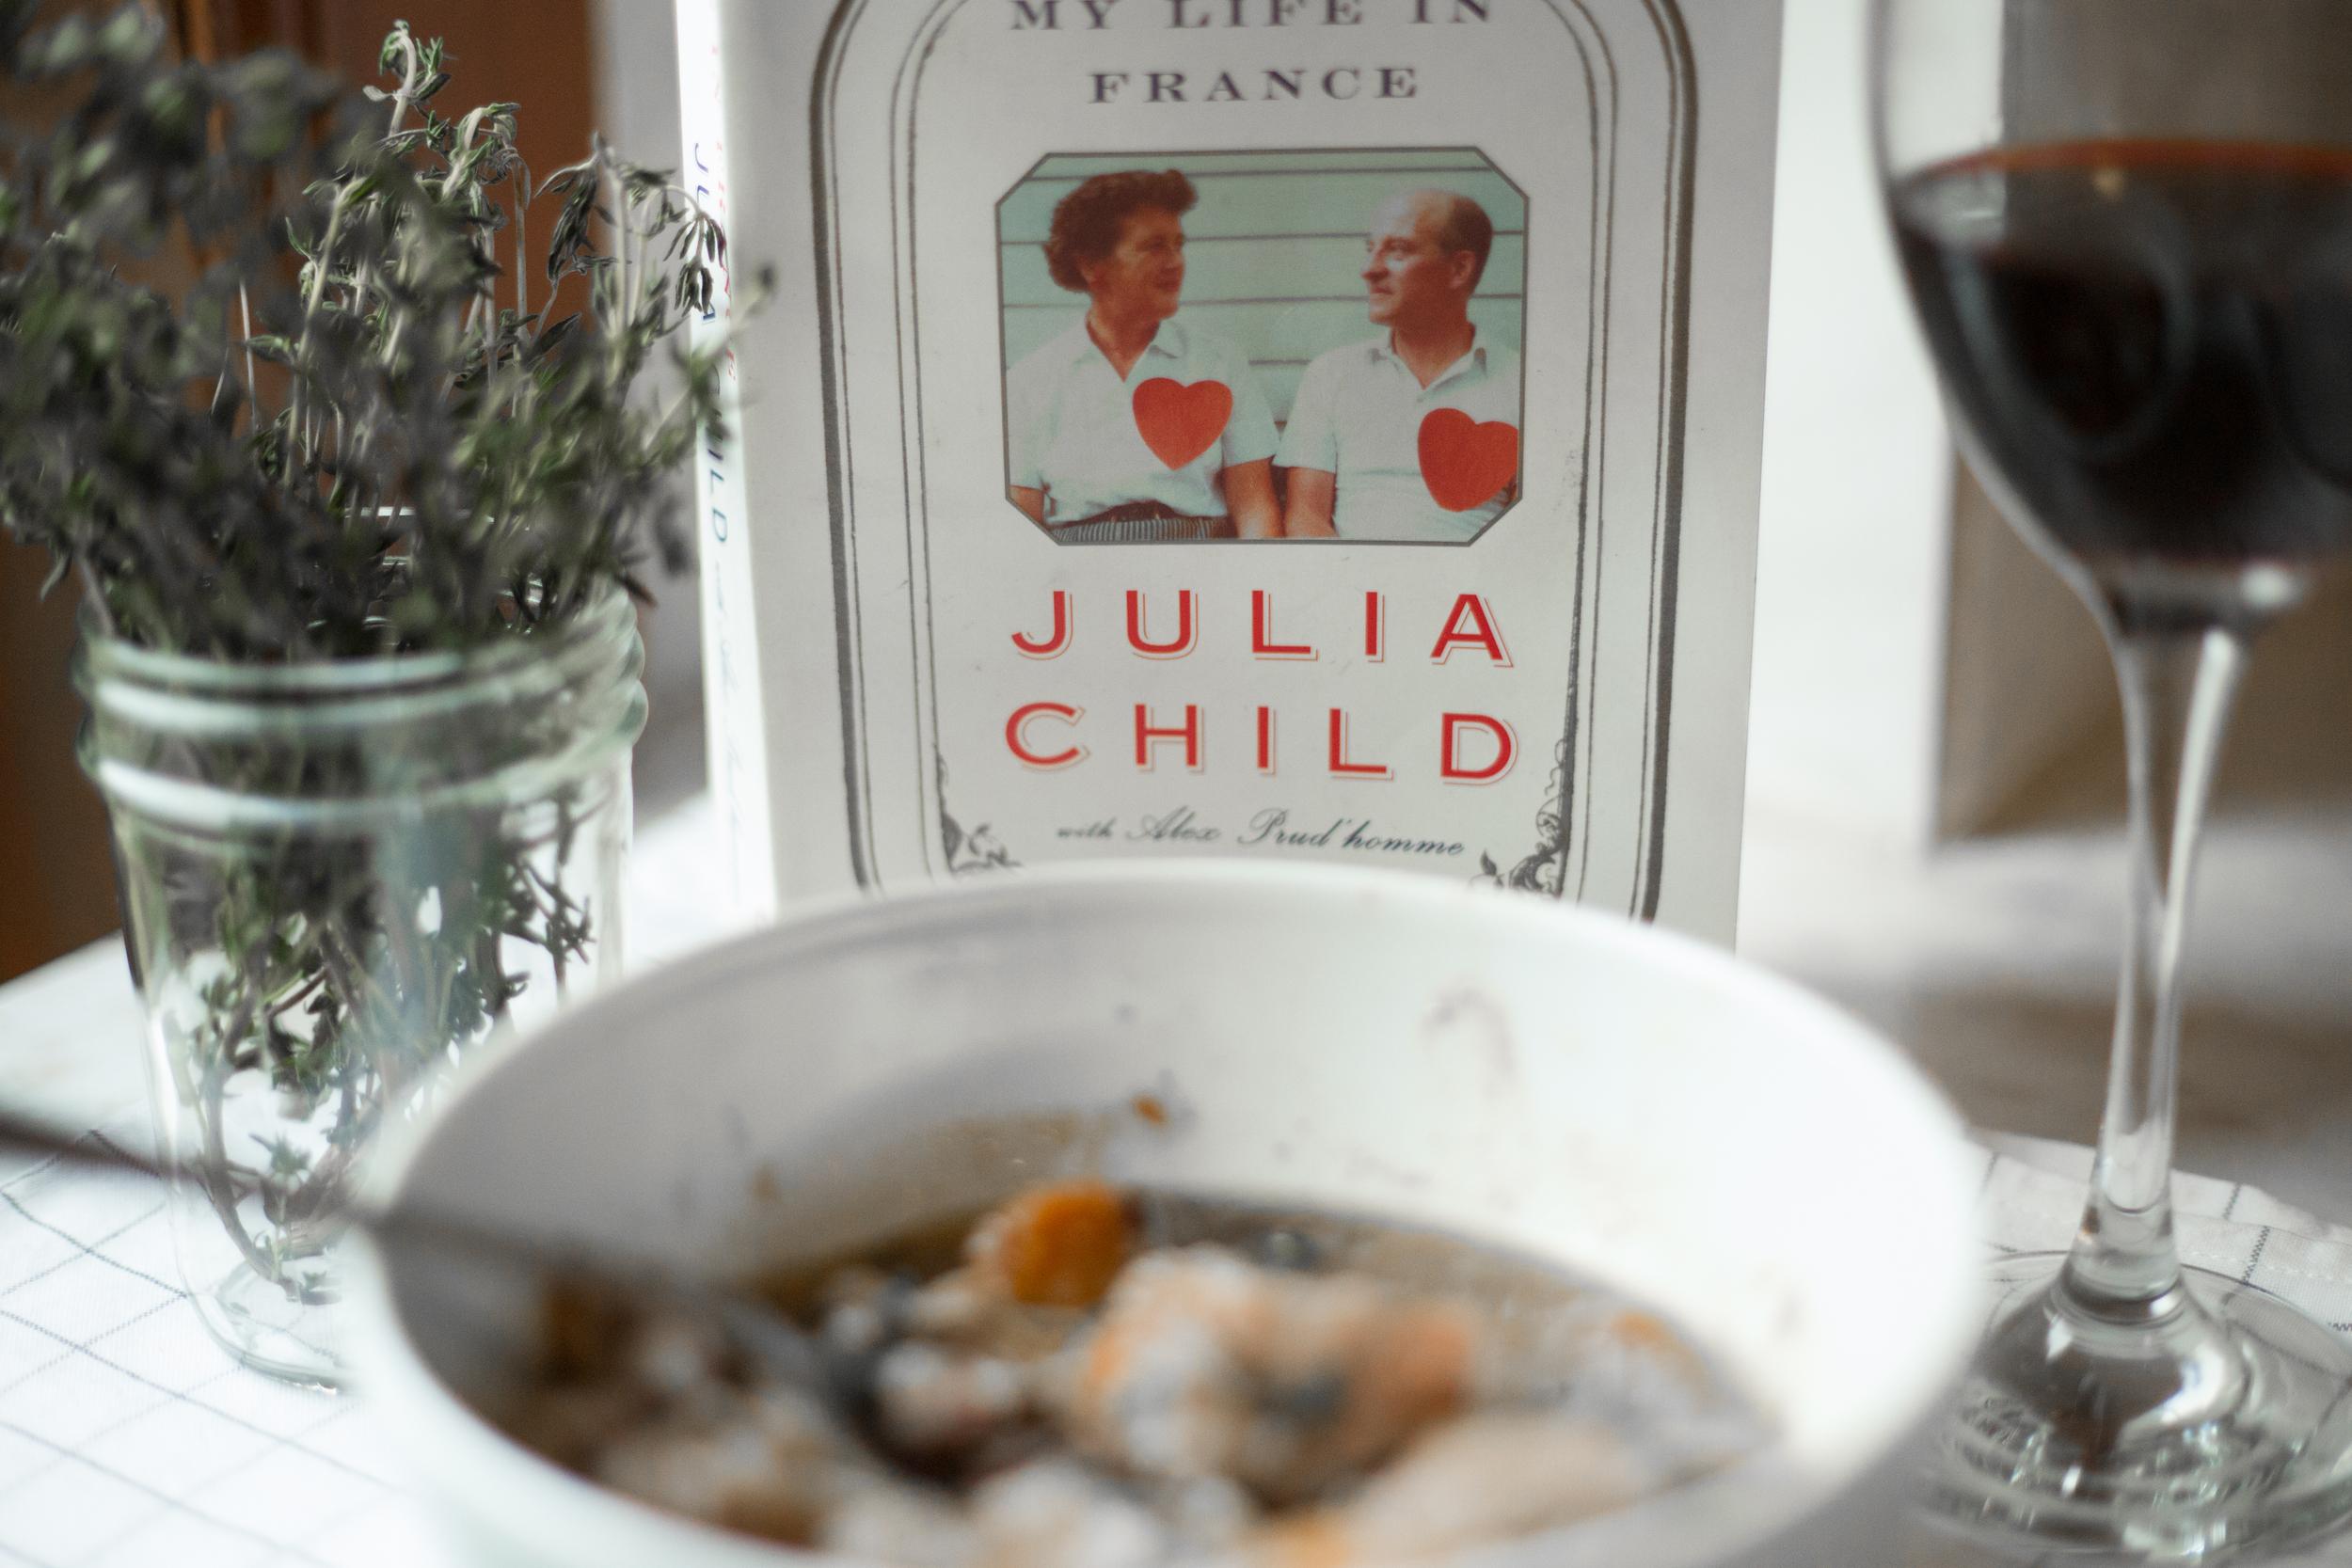 Julia Child Coq au vin